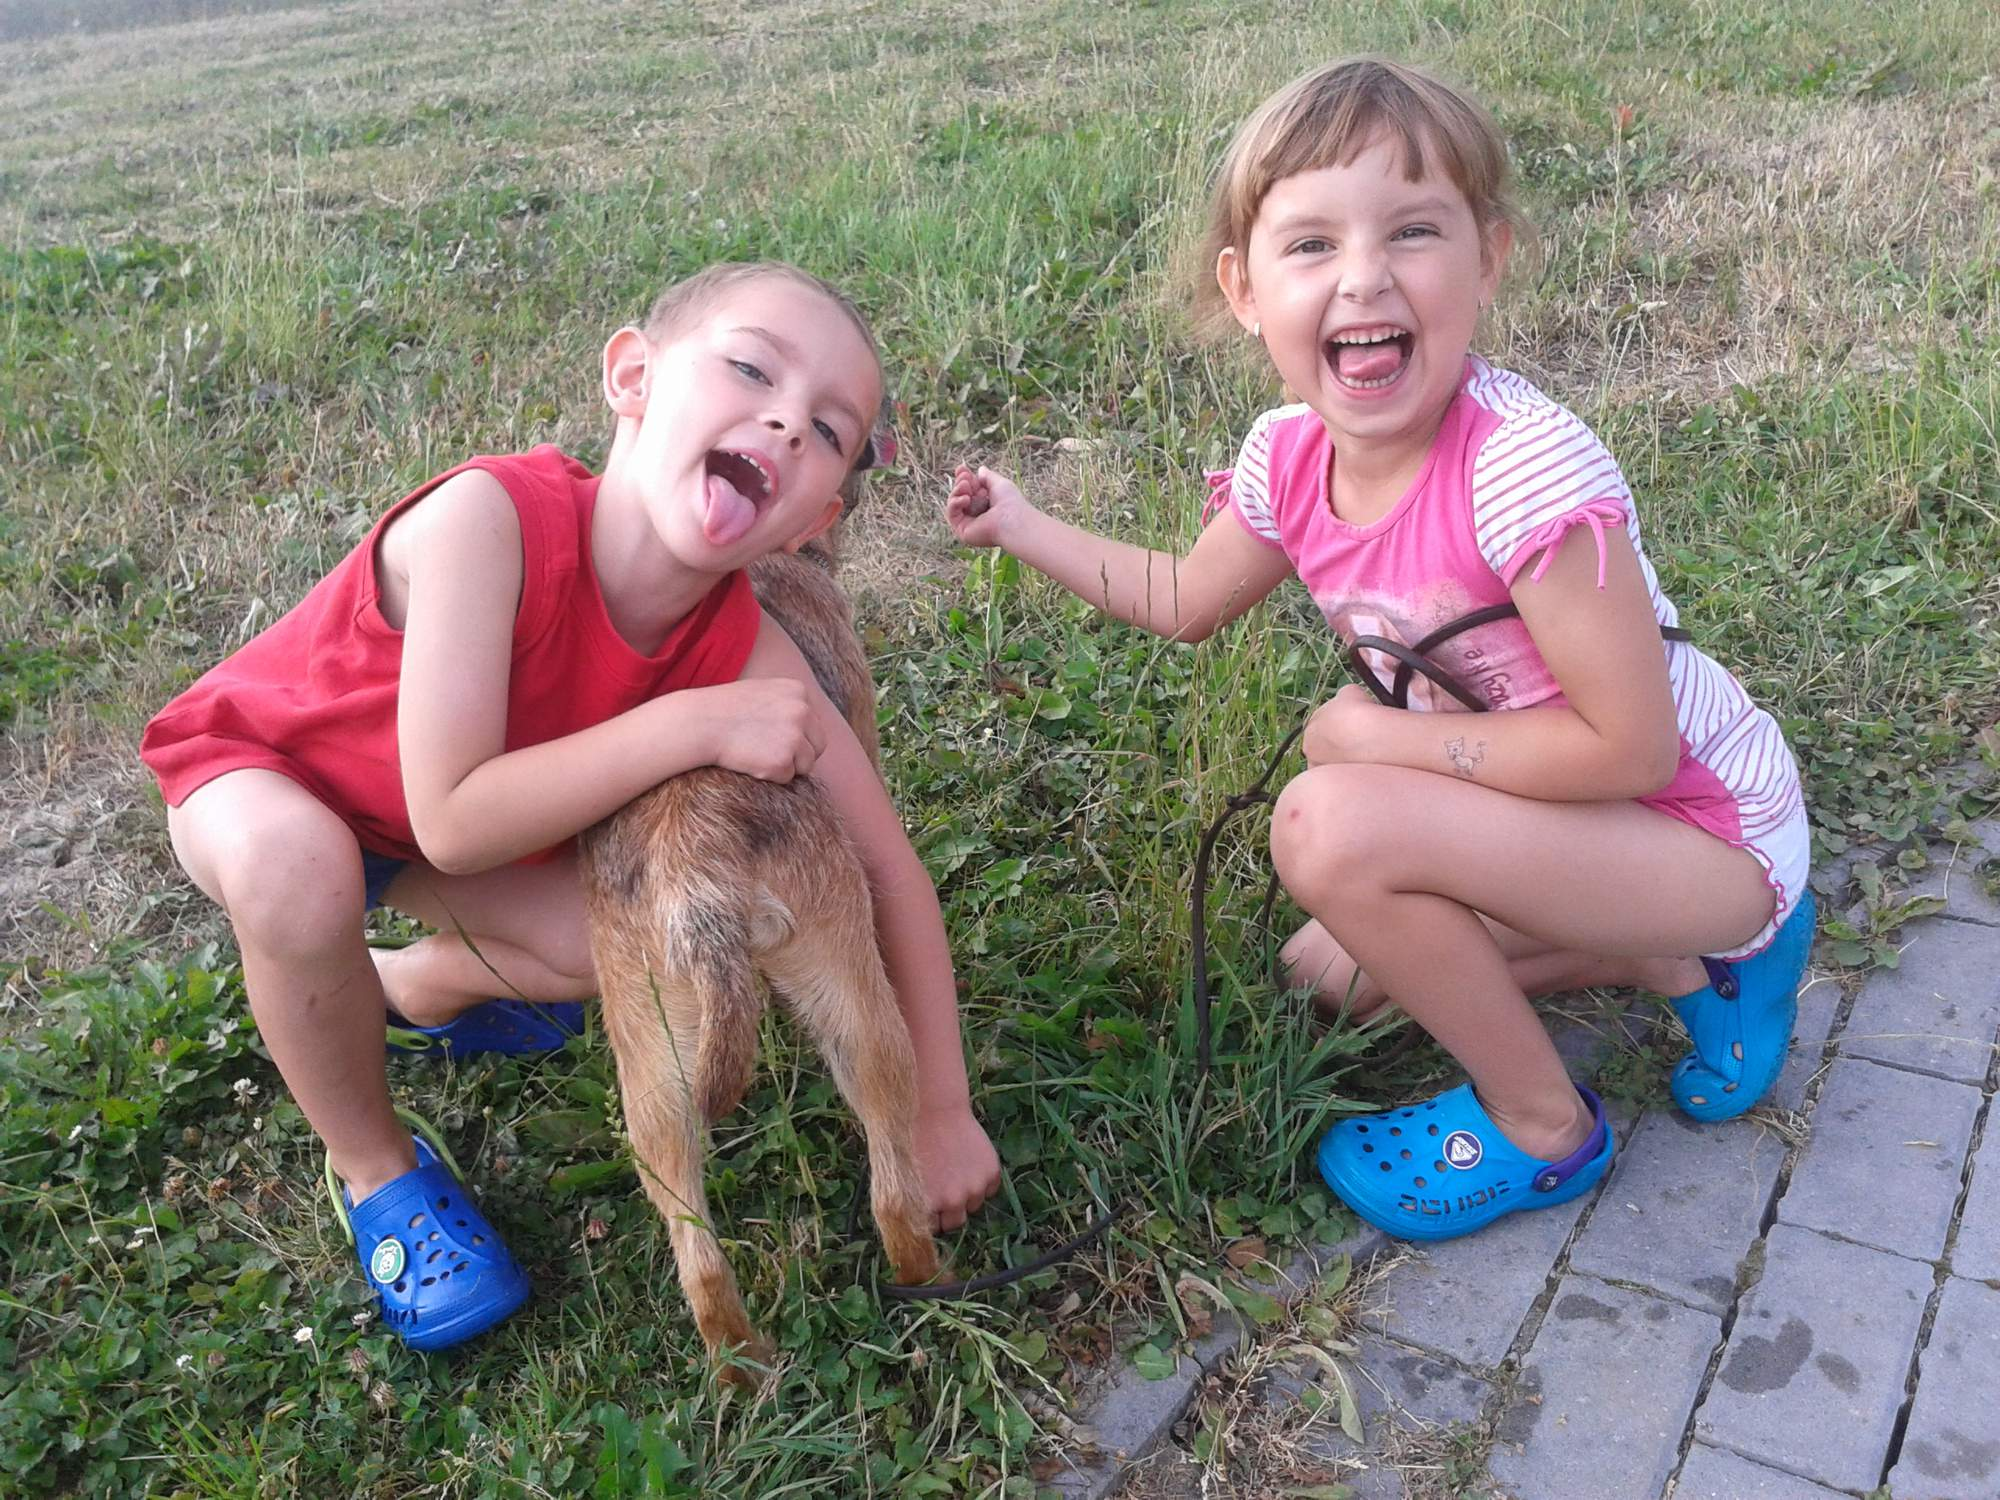 rajce.ru deti 2013 Rajce Idnes Deti Related Keywords & Suggestions ...